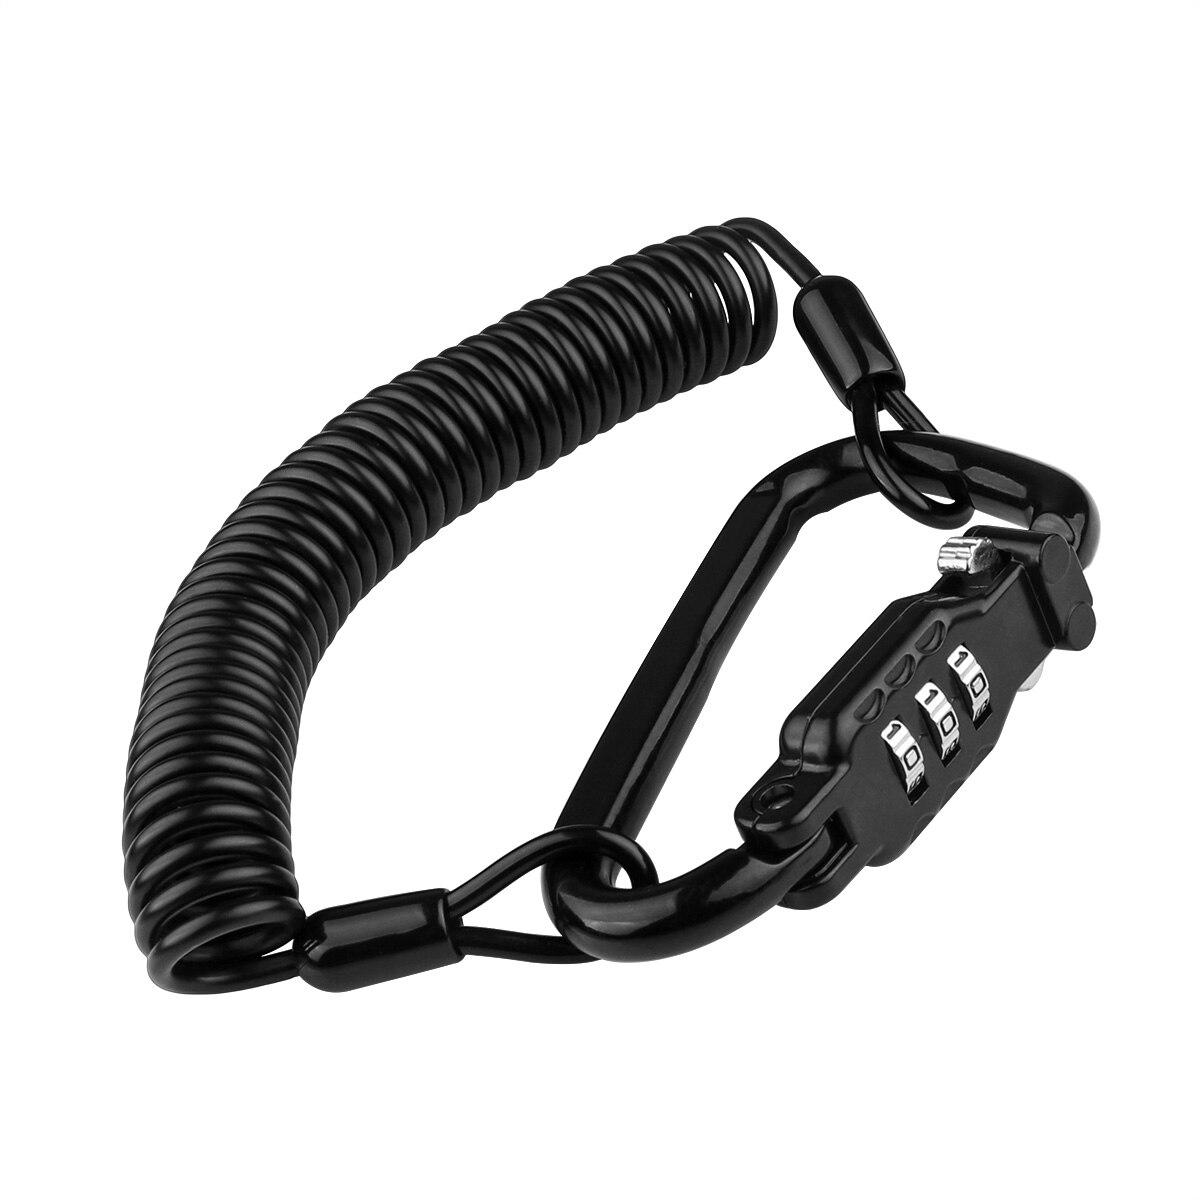 Motorcycle Accessories Password Code Bike Cable Lock